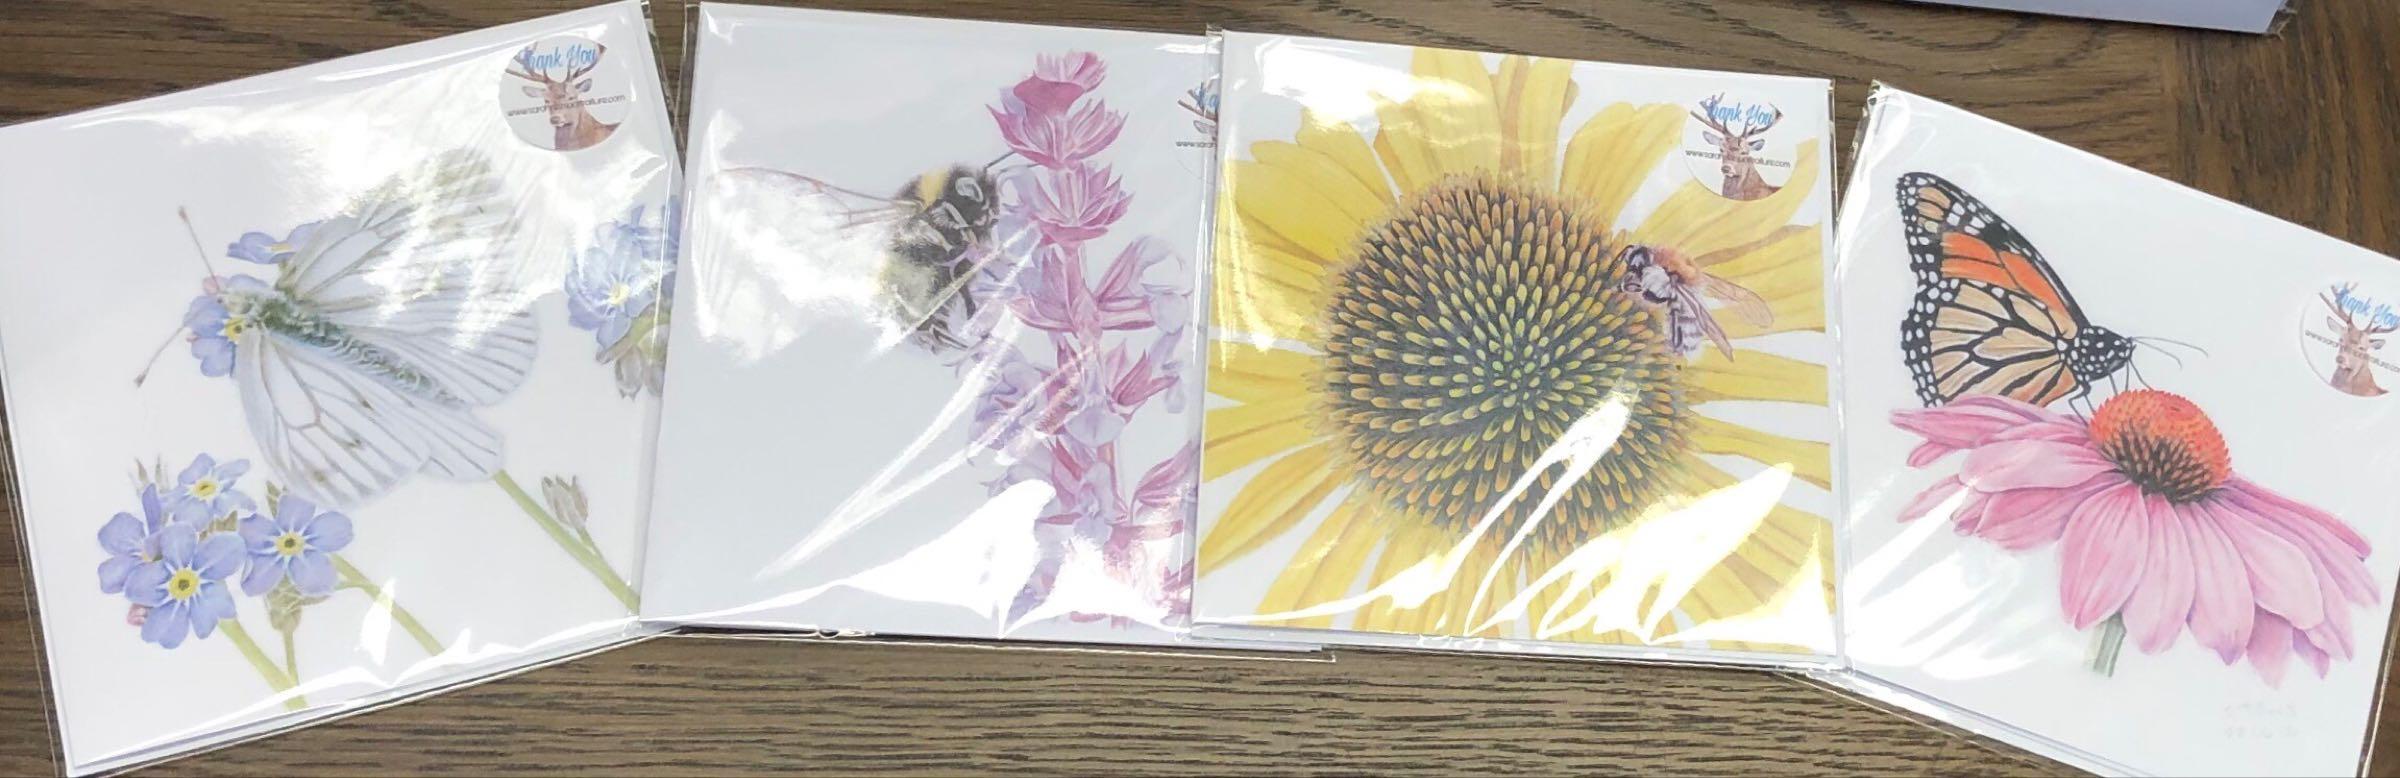 Sarah Rees greeting cards